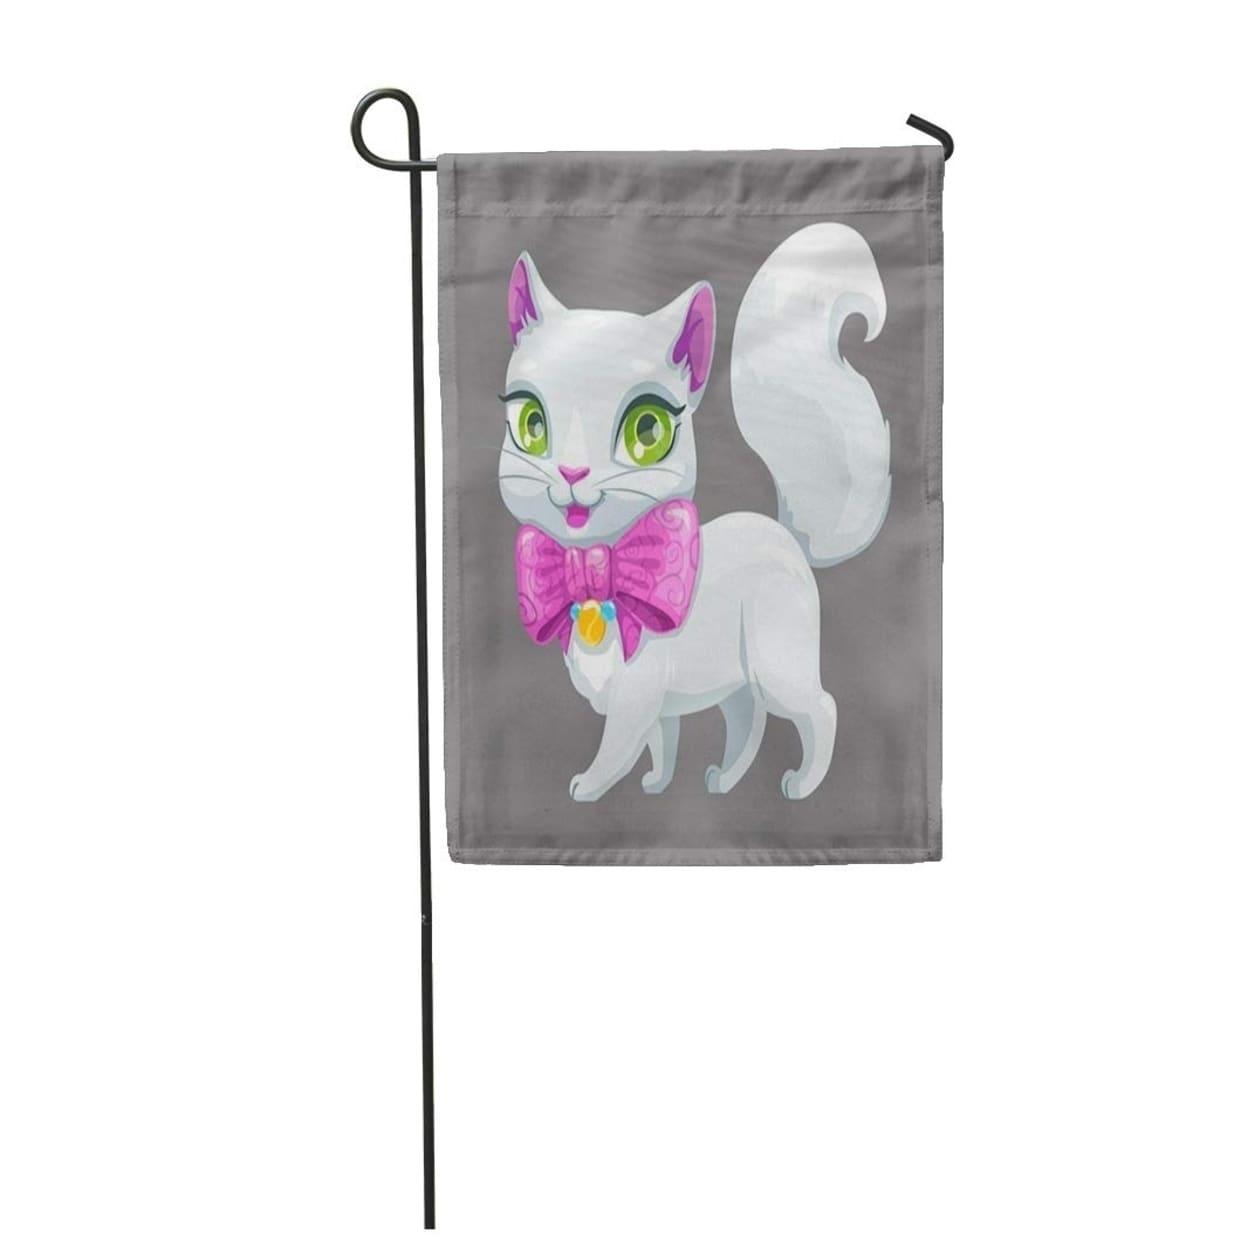 Shop Pink Kitten Cute Cartoon Fluffy White Cat Kitty Girl Adorable Beautiful Big Garden Flag Decorative Flag House Banner On Sale Overstock 31350115